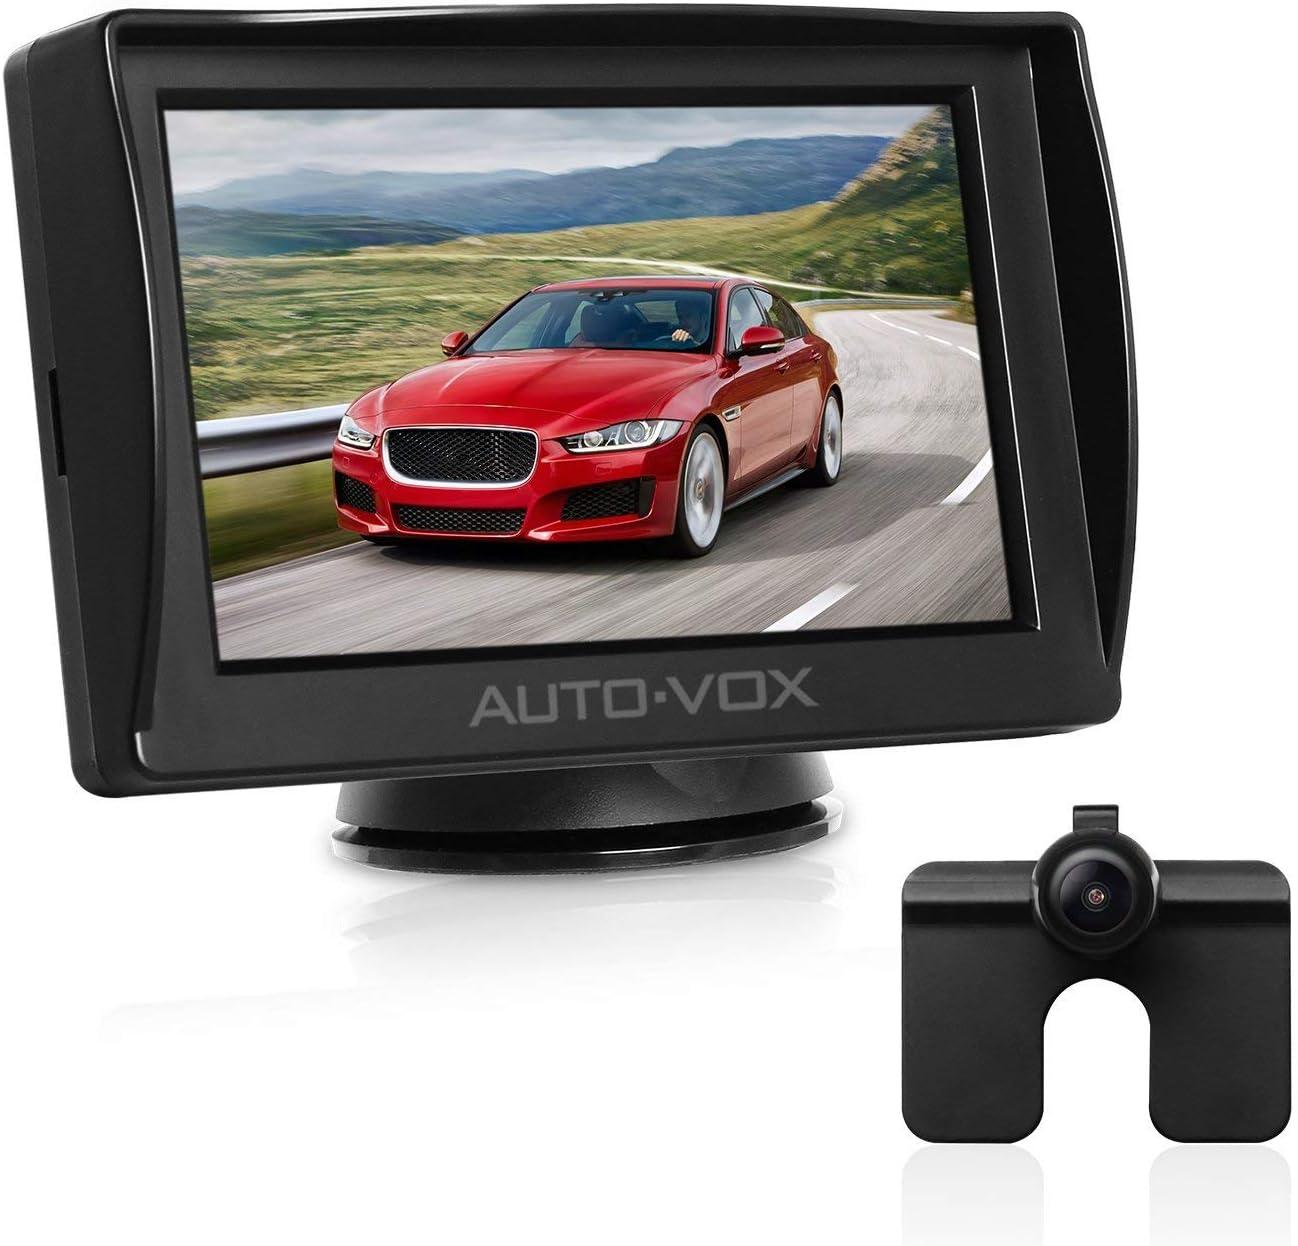 4.3 /'/' LCD Auto Rückfahrkamera Nummernschild Rückansichtkamera Mit